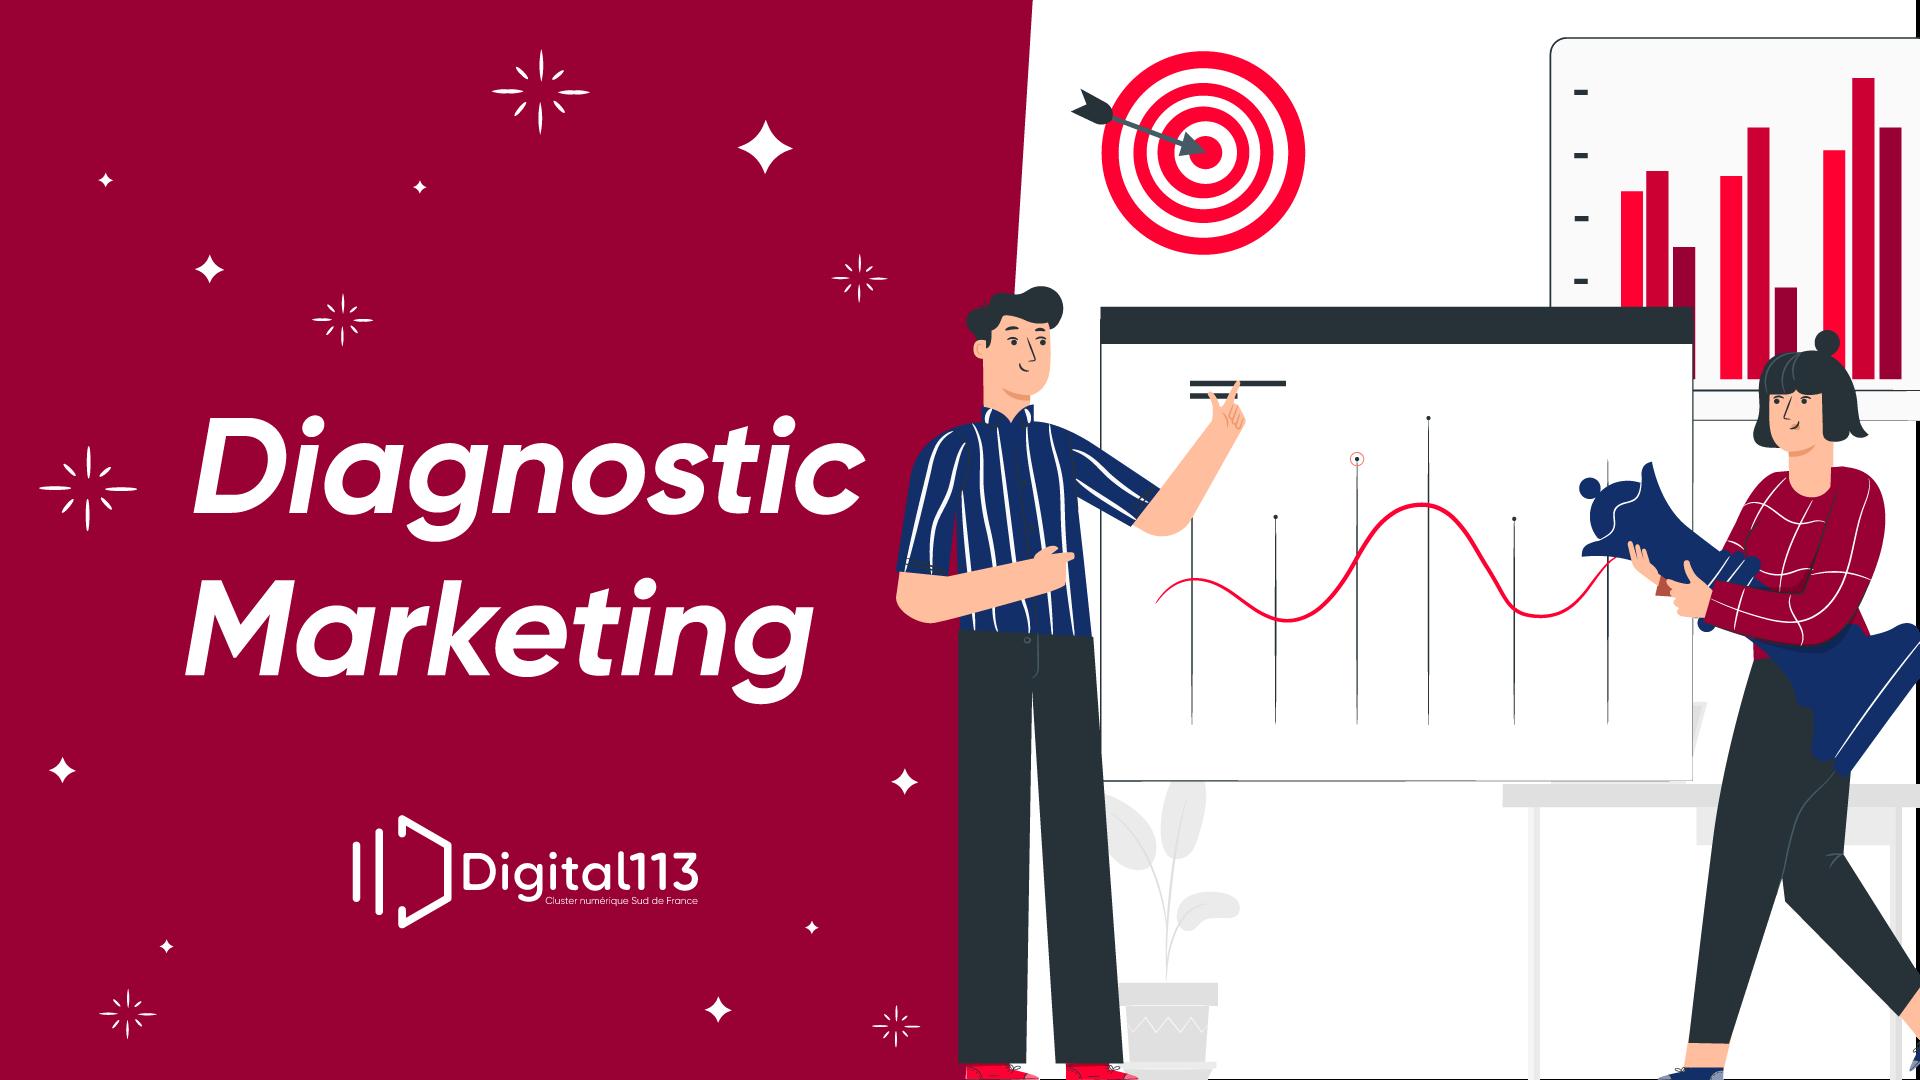 Diagnostic Marketing Digital